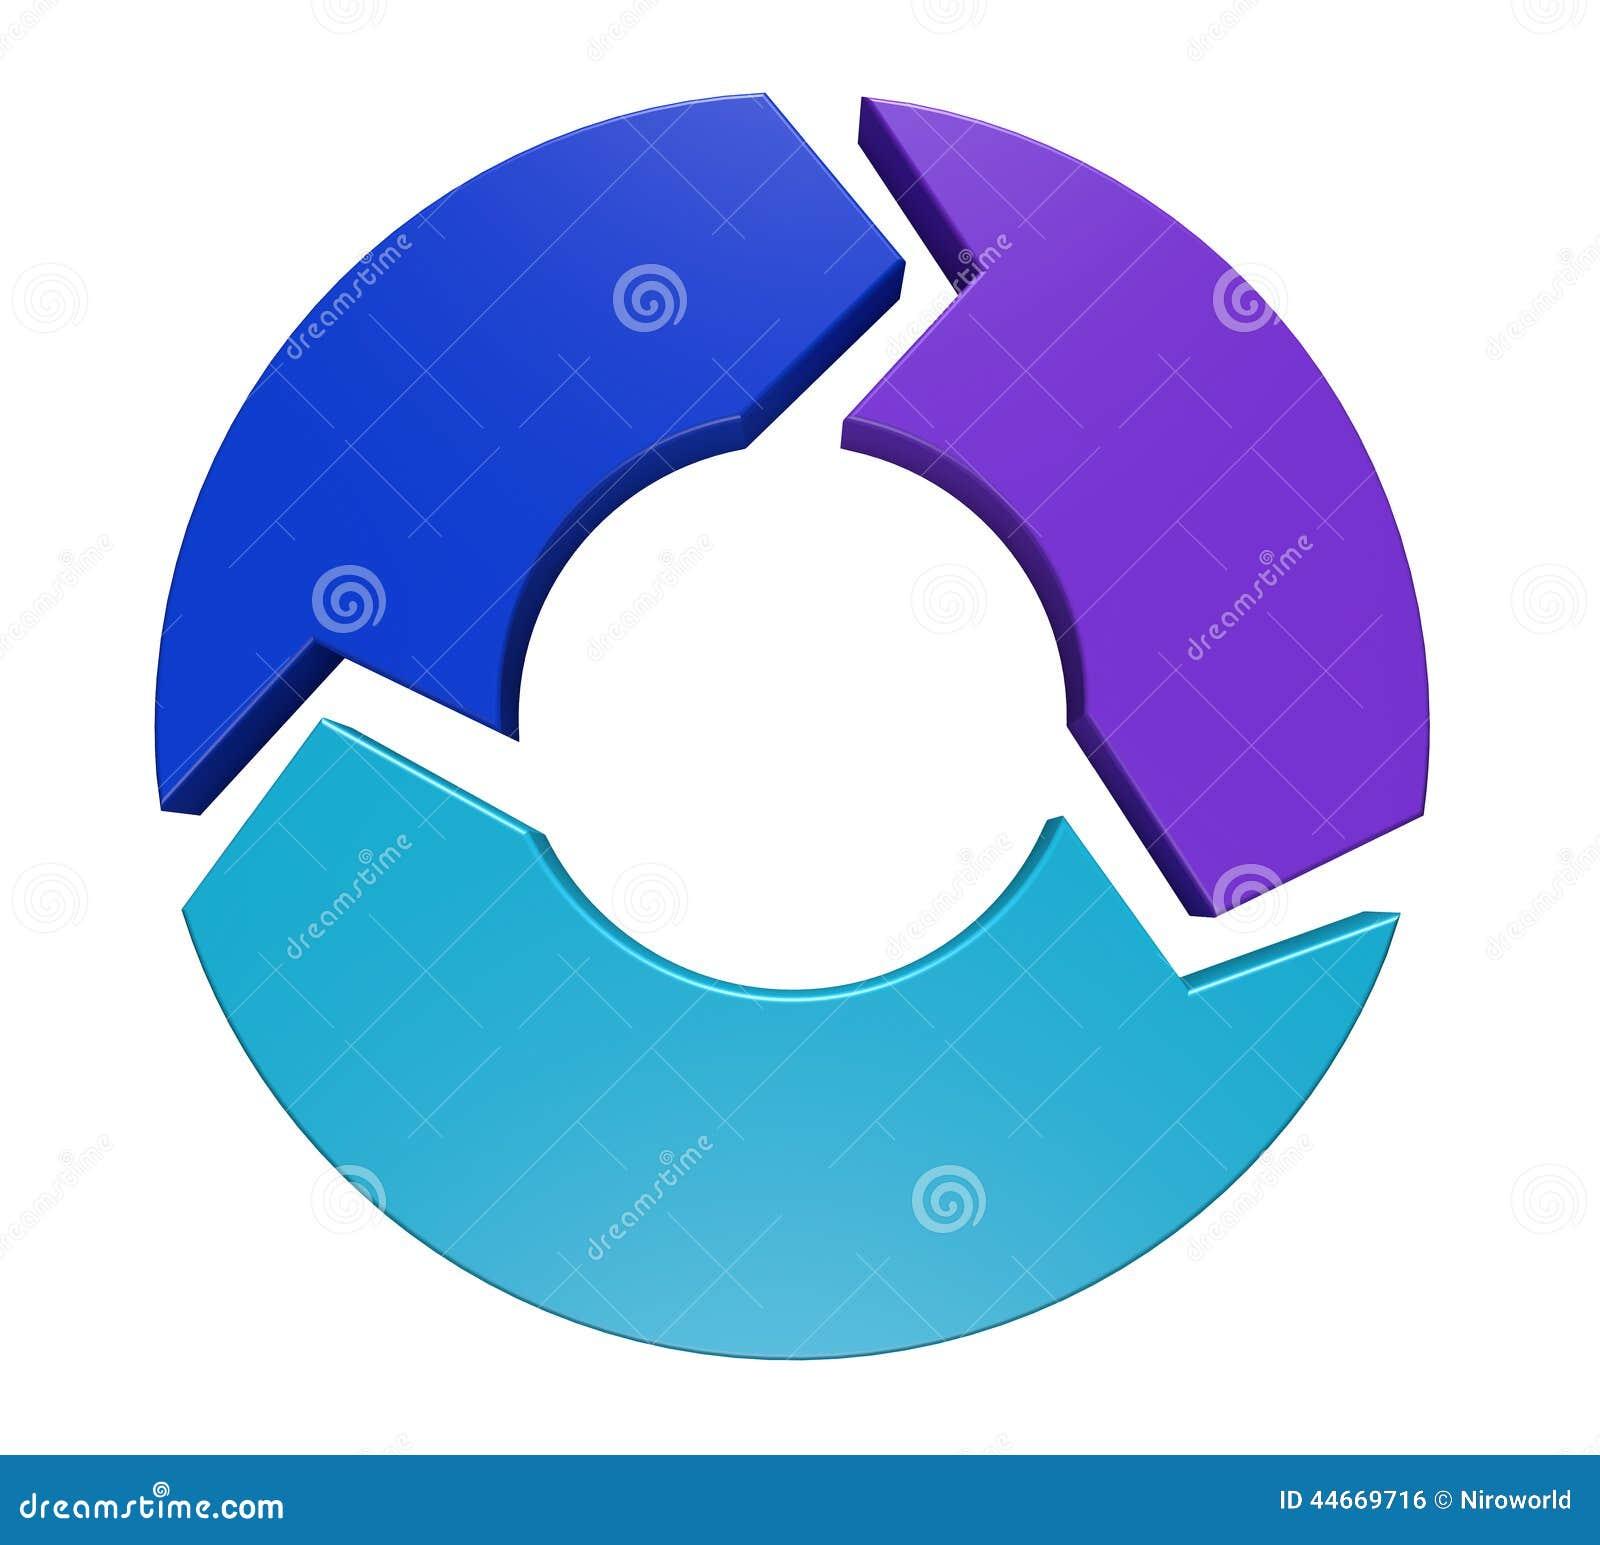 business plan cycle diagram stock illustration image. Black Bedroom Furniture Sets. Home Design Ideas